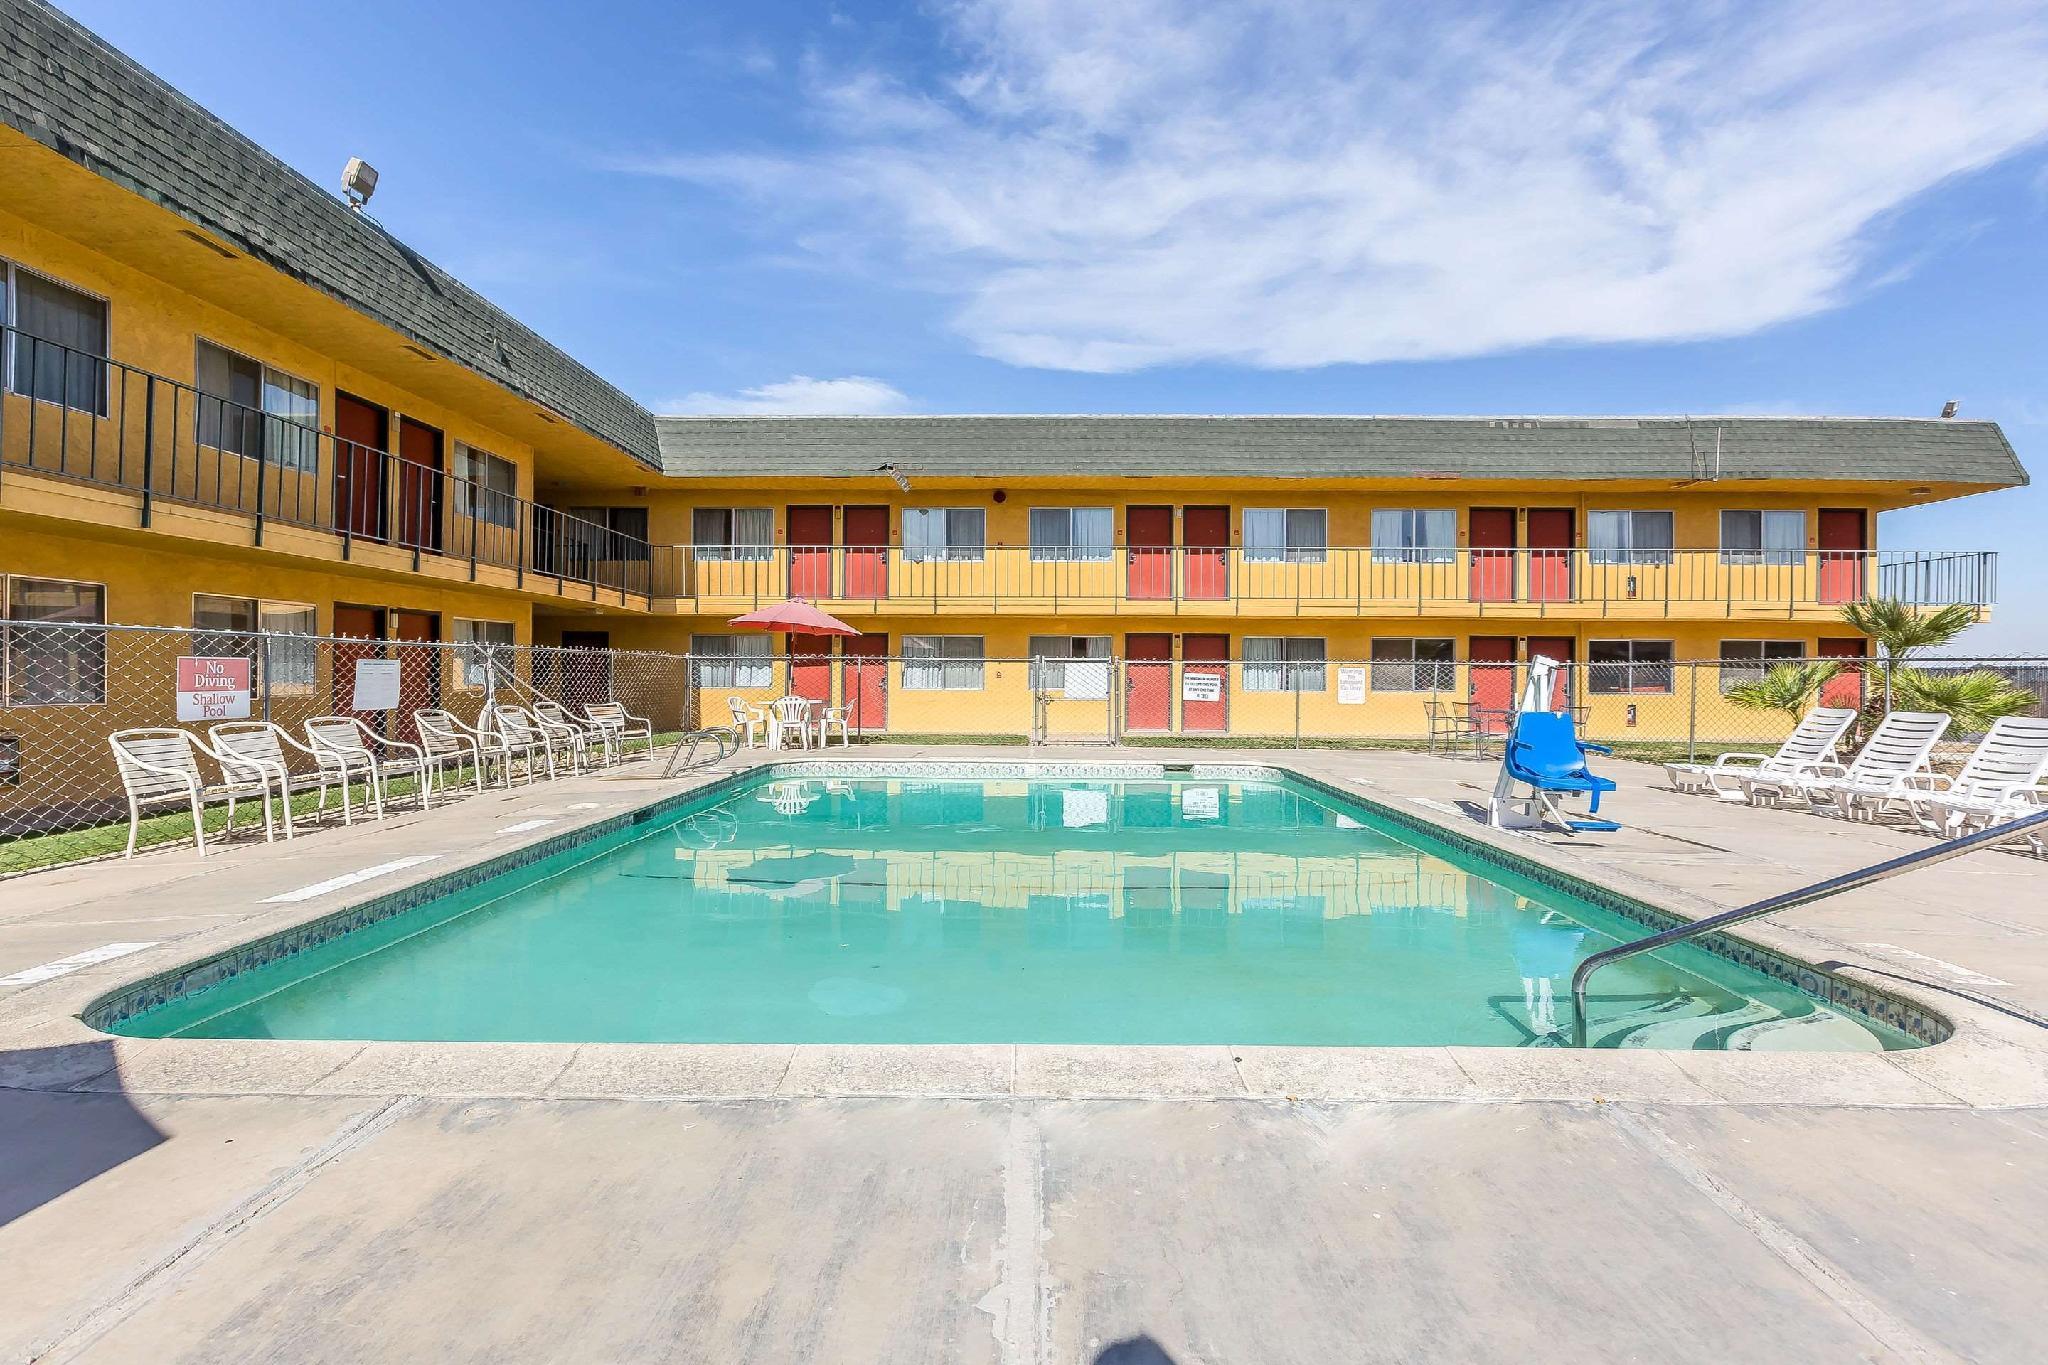 SureStay Hotel By Best Western Buttonwillow